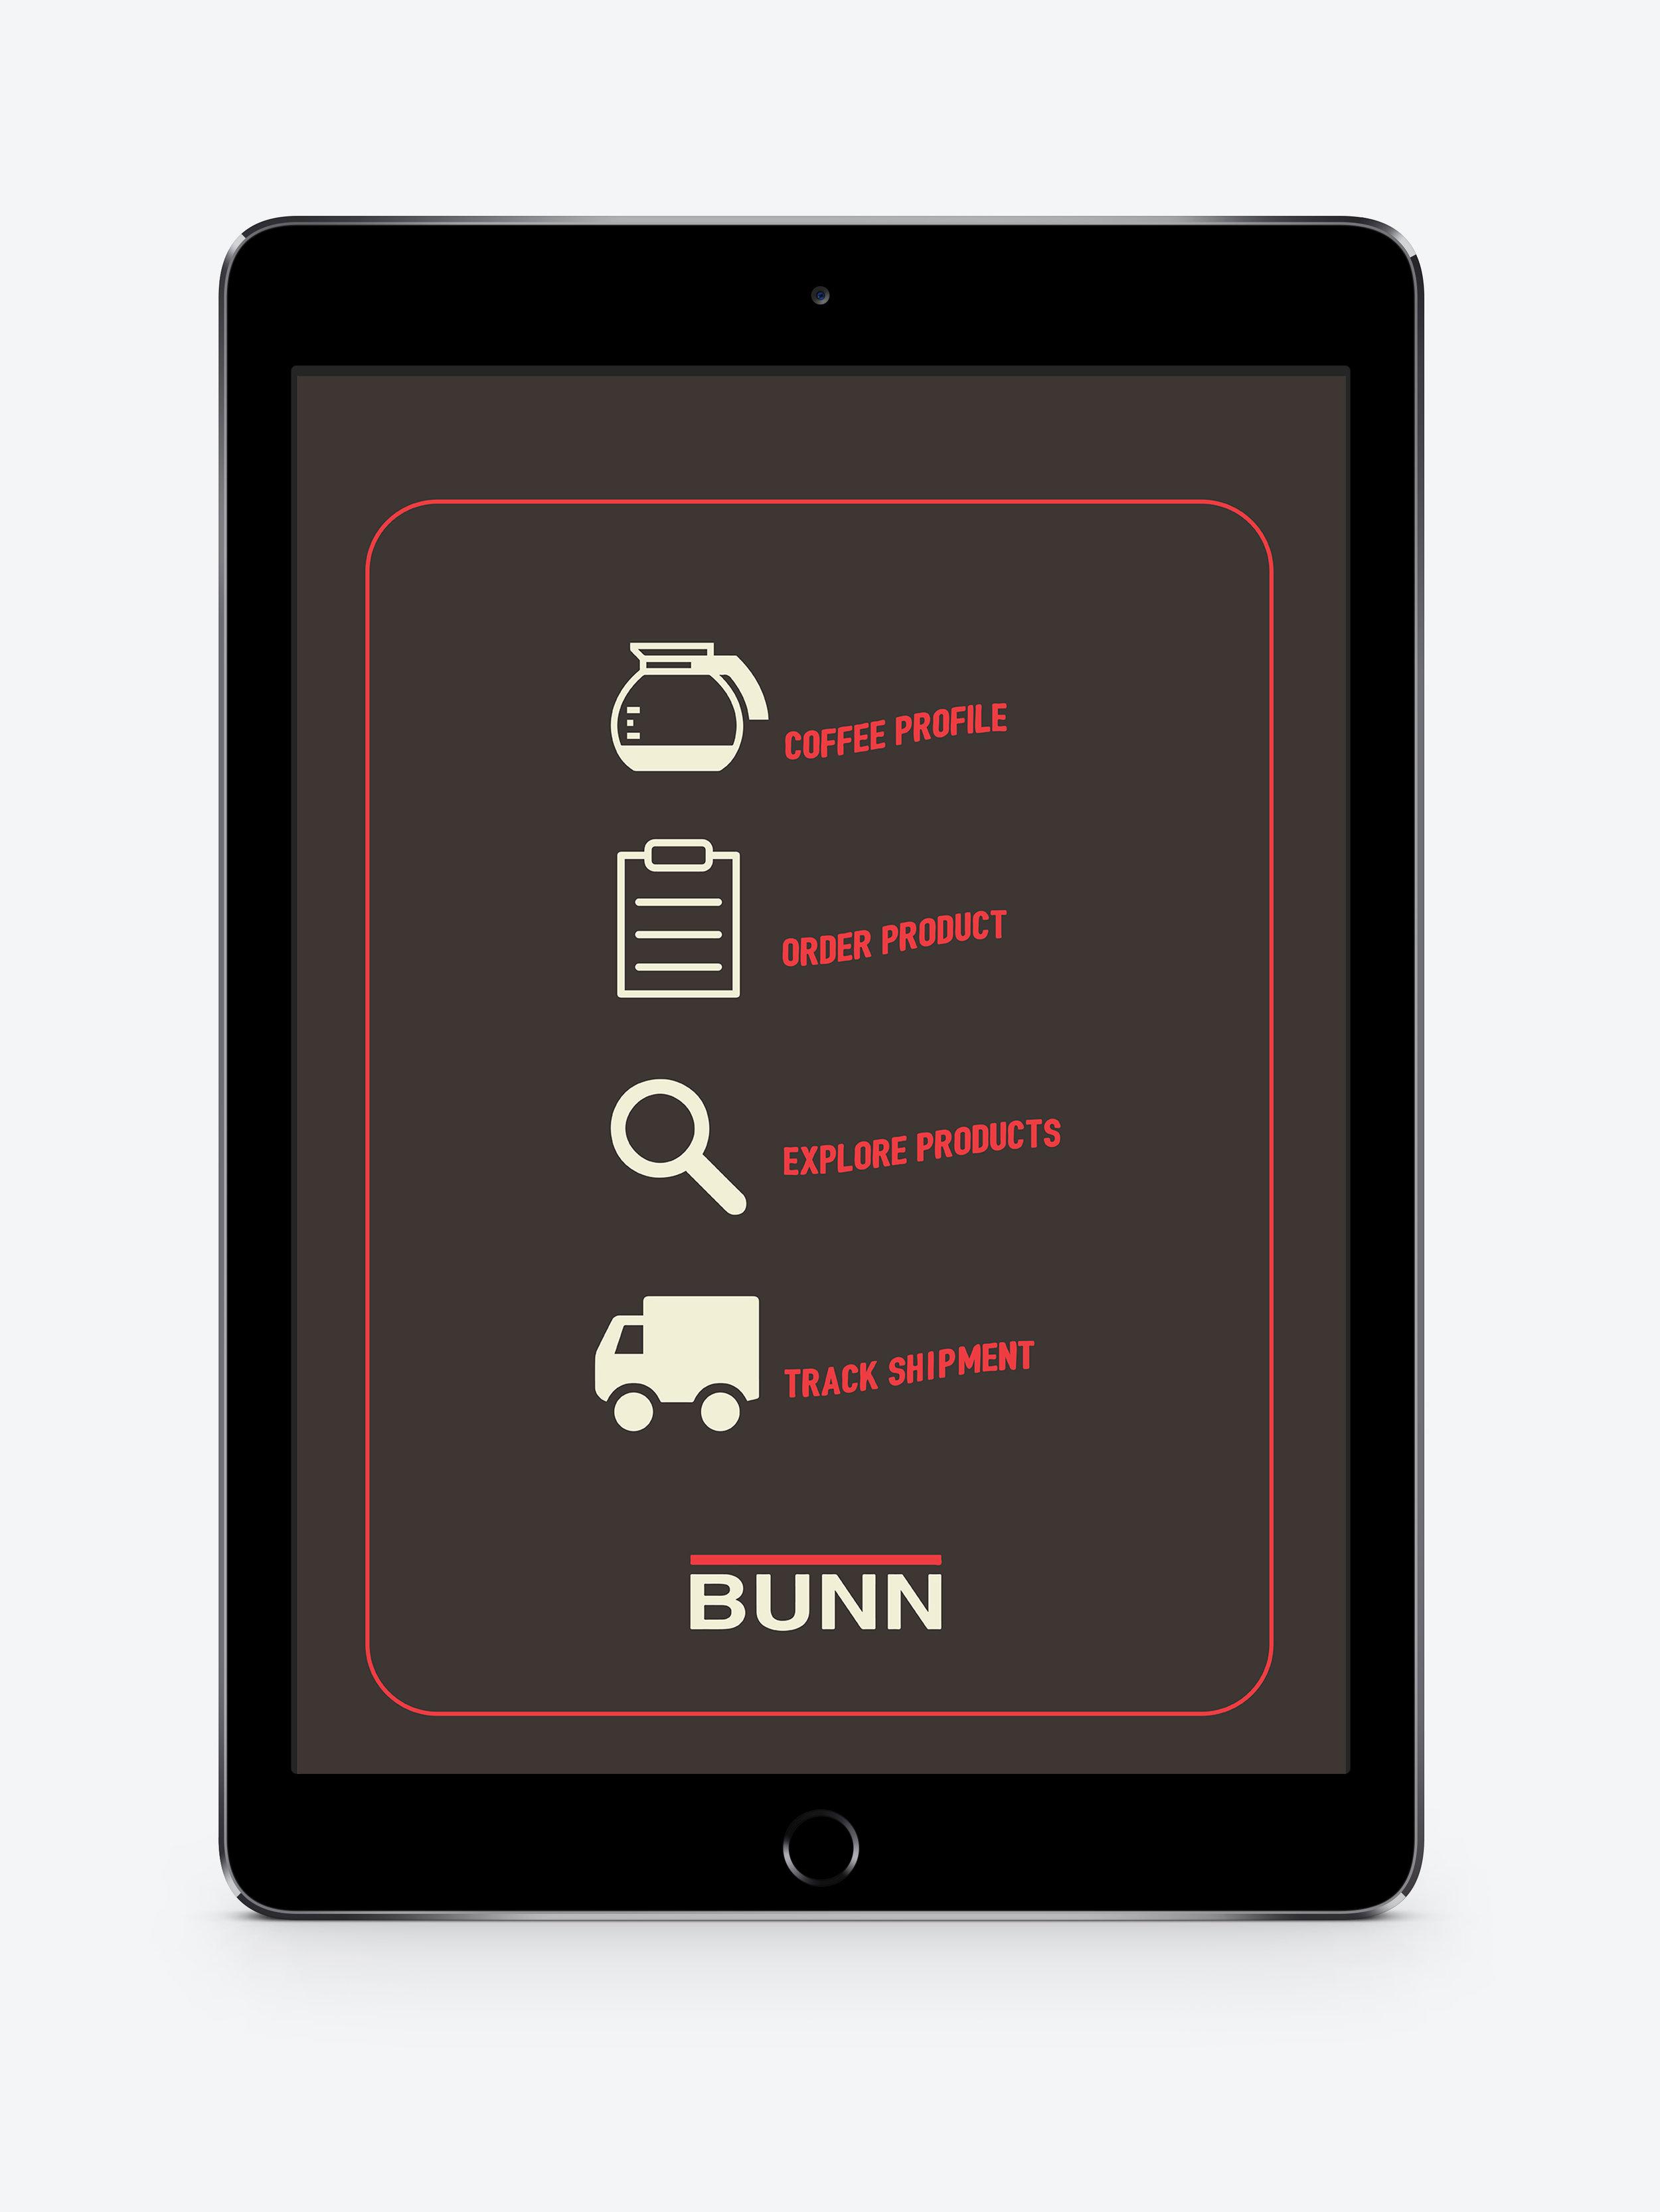 Bunn_Ipad_screen3.jpg